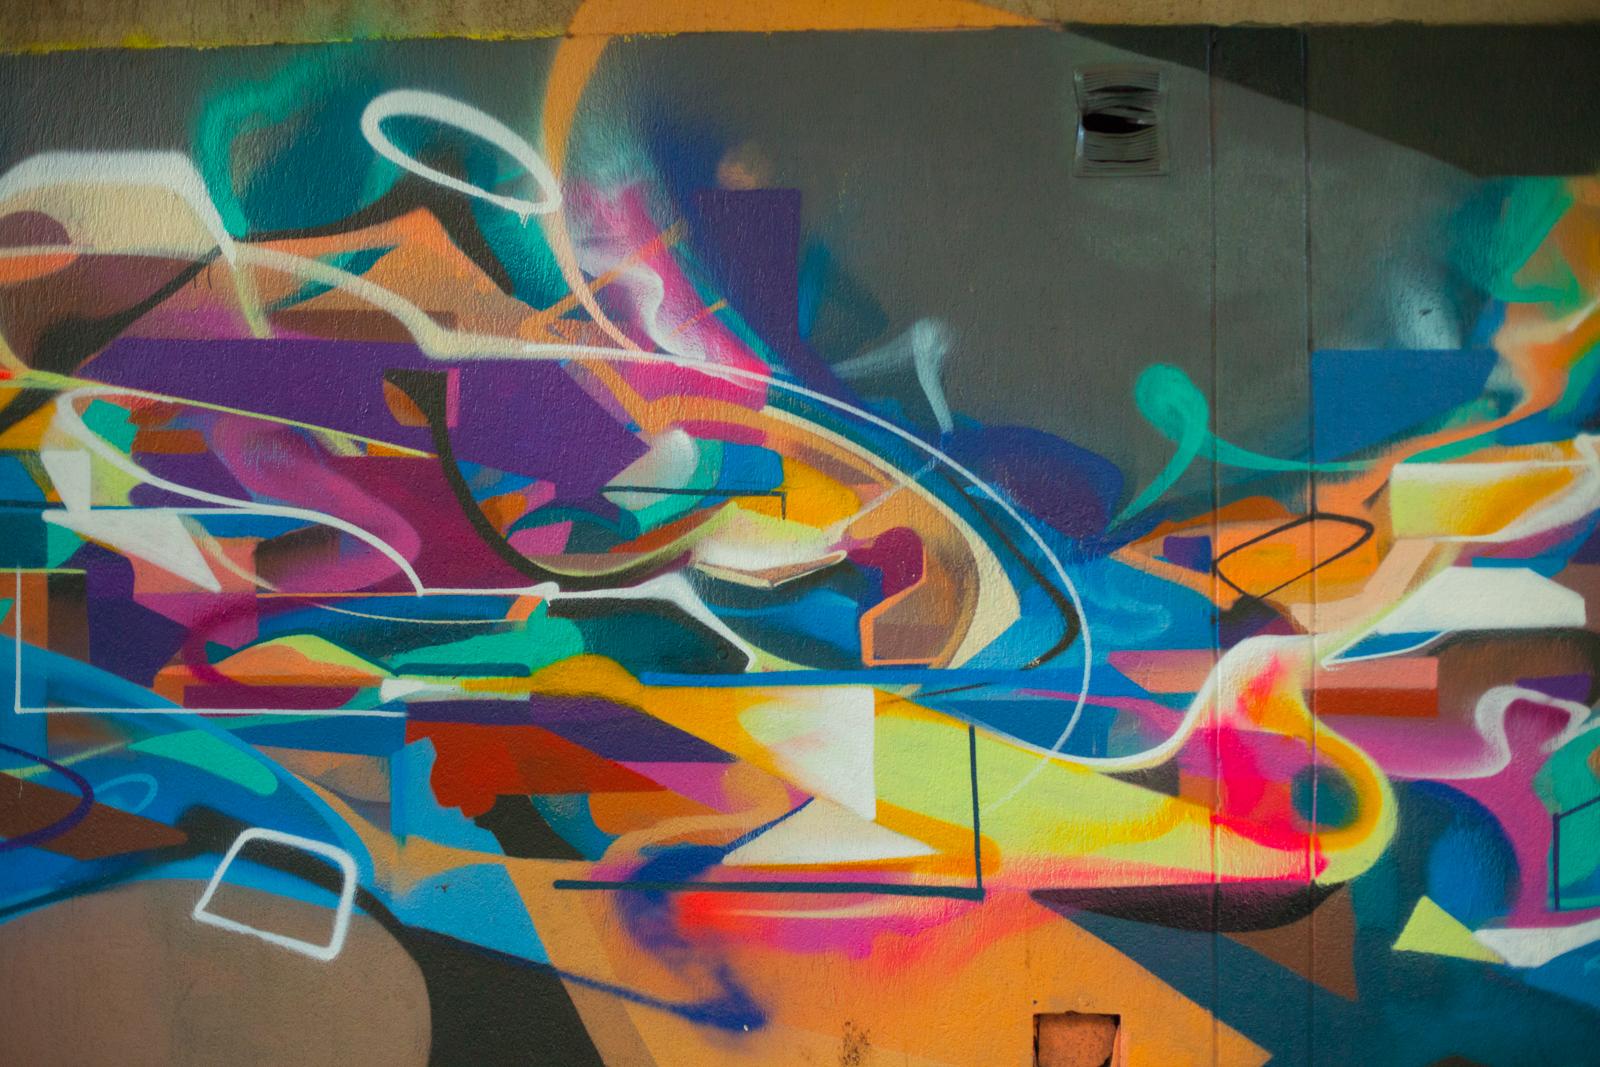 street art vitry-sur-seine, street art vitry, street art val-de-marne, street art banlieue paris, art urbain vitry, art urbain vitry-sur-seine, art urbain vitry, le guide du street art à paris, stéphanie lombard